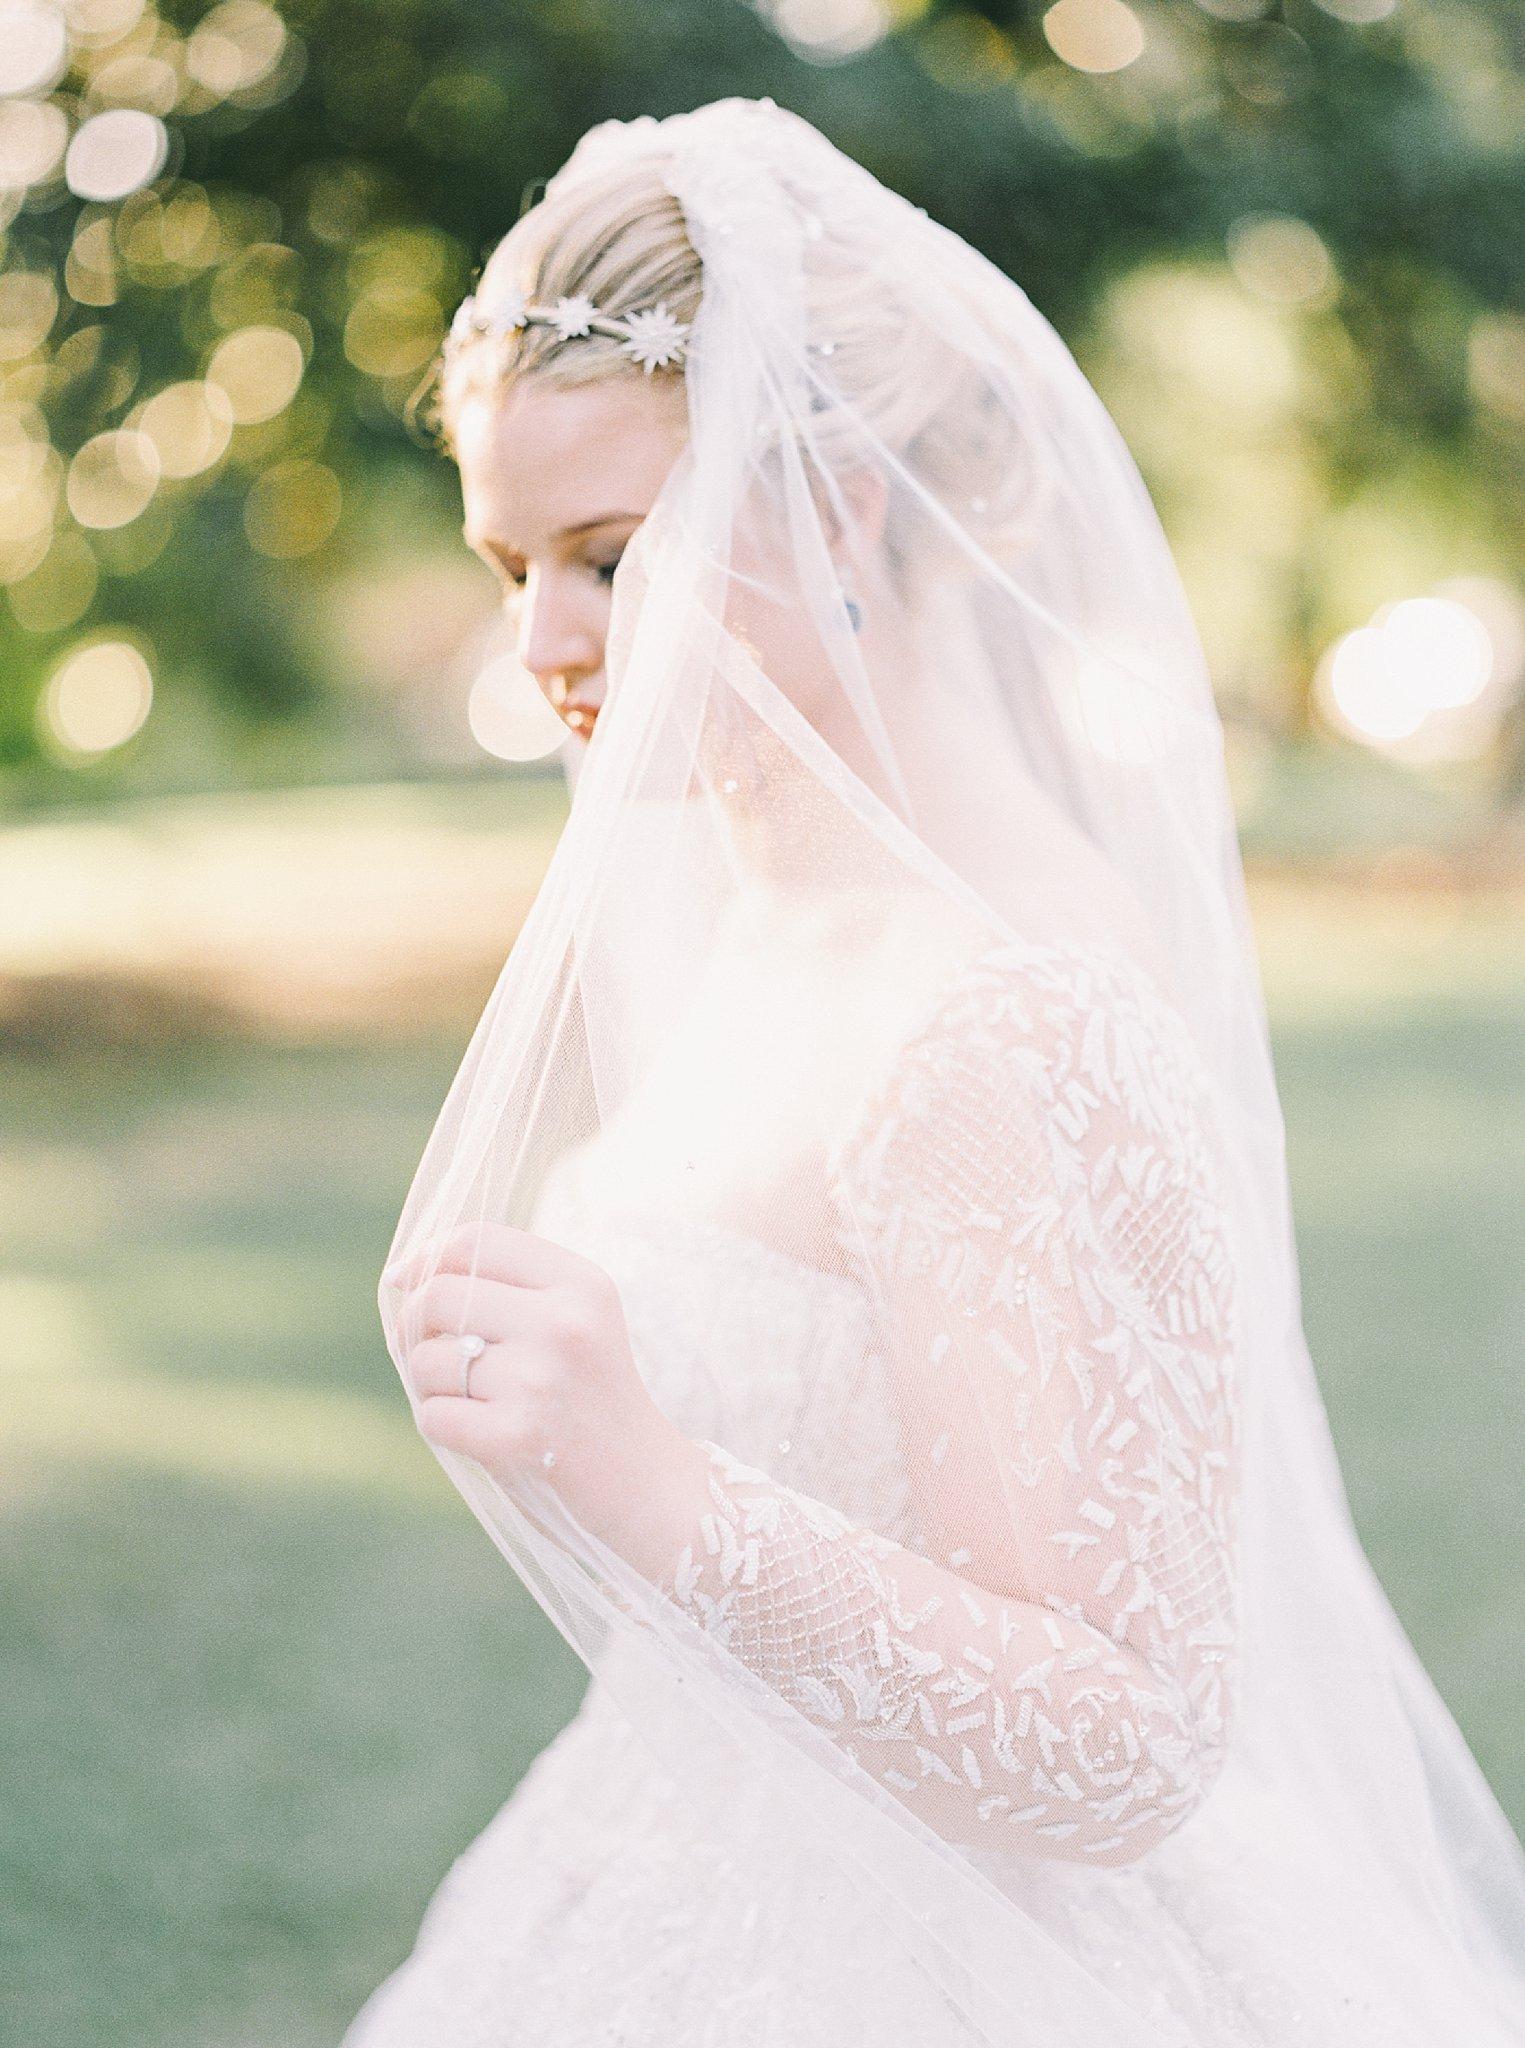 xan Charleston wedding photographer7.jpg